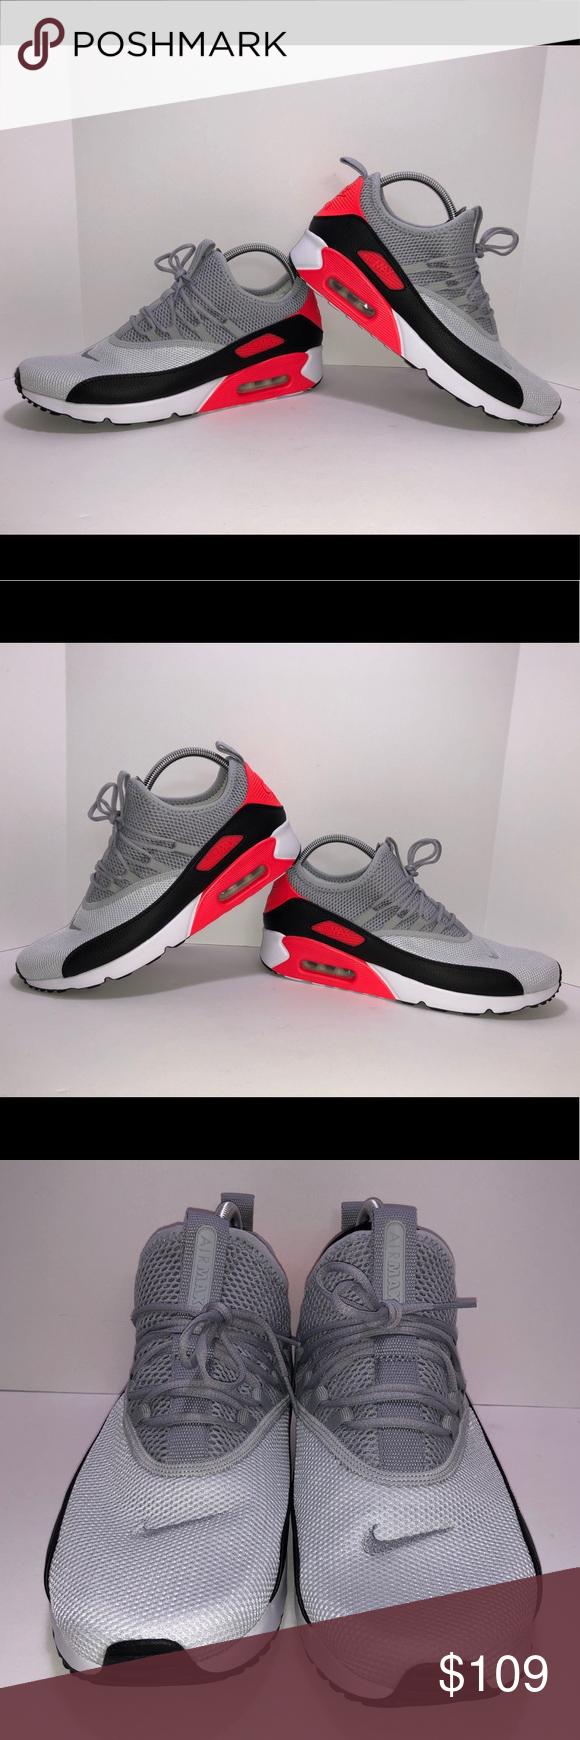 2798e5396 Nike Air Max 90 EZ Men s Brand New. Original Box  No Lid. Never